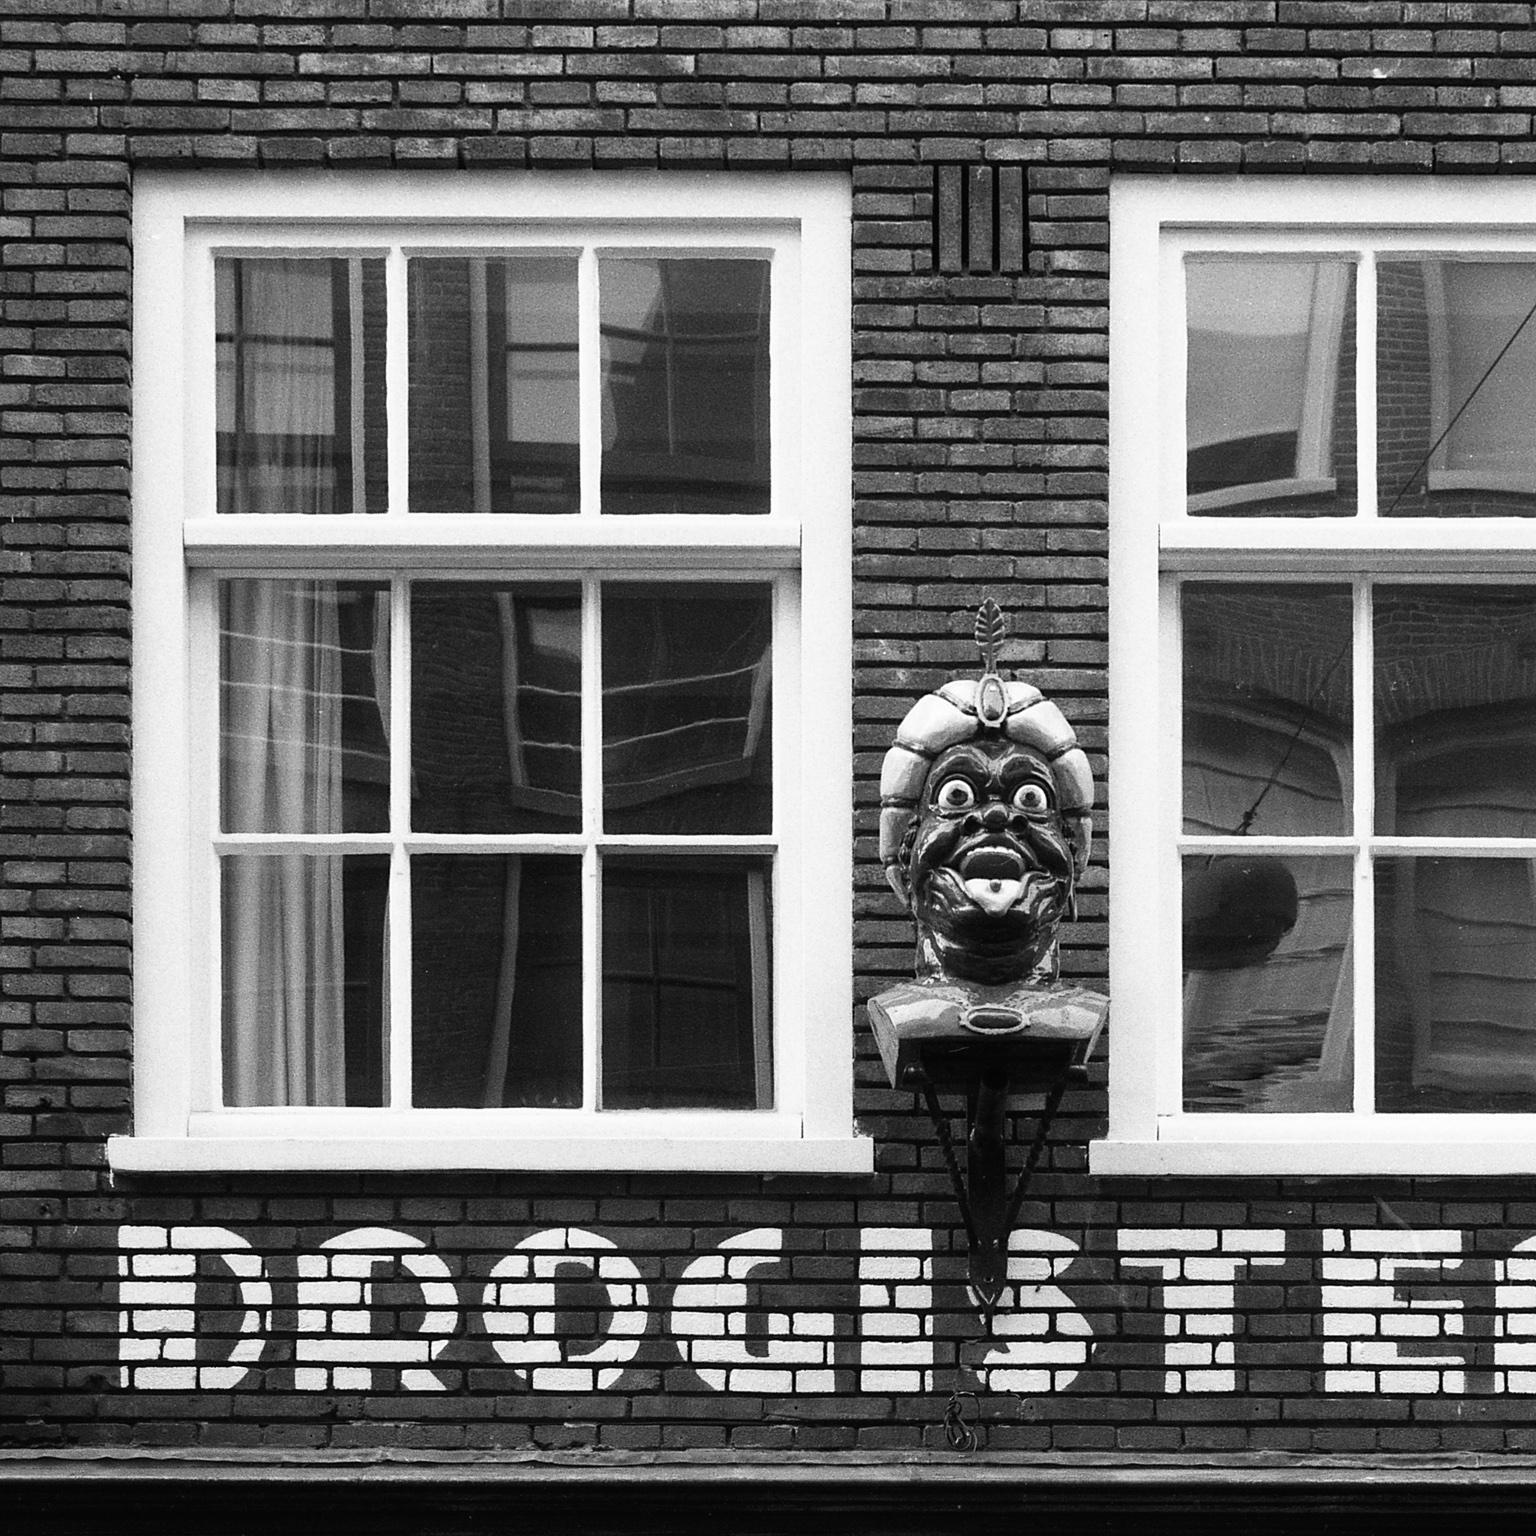 019-Amsterdam.jpg